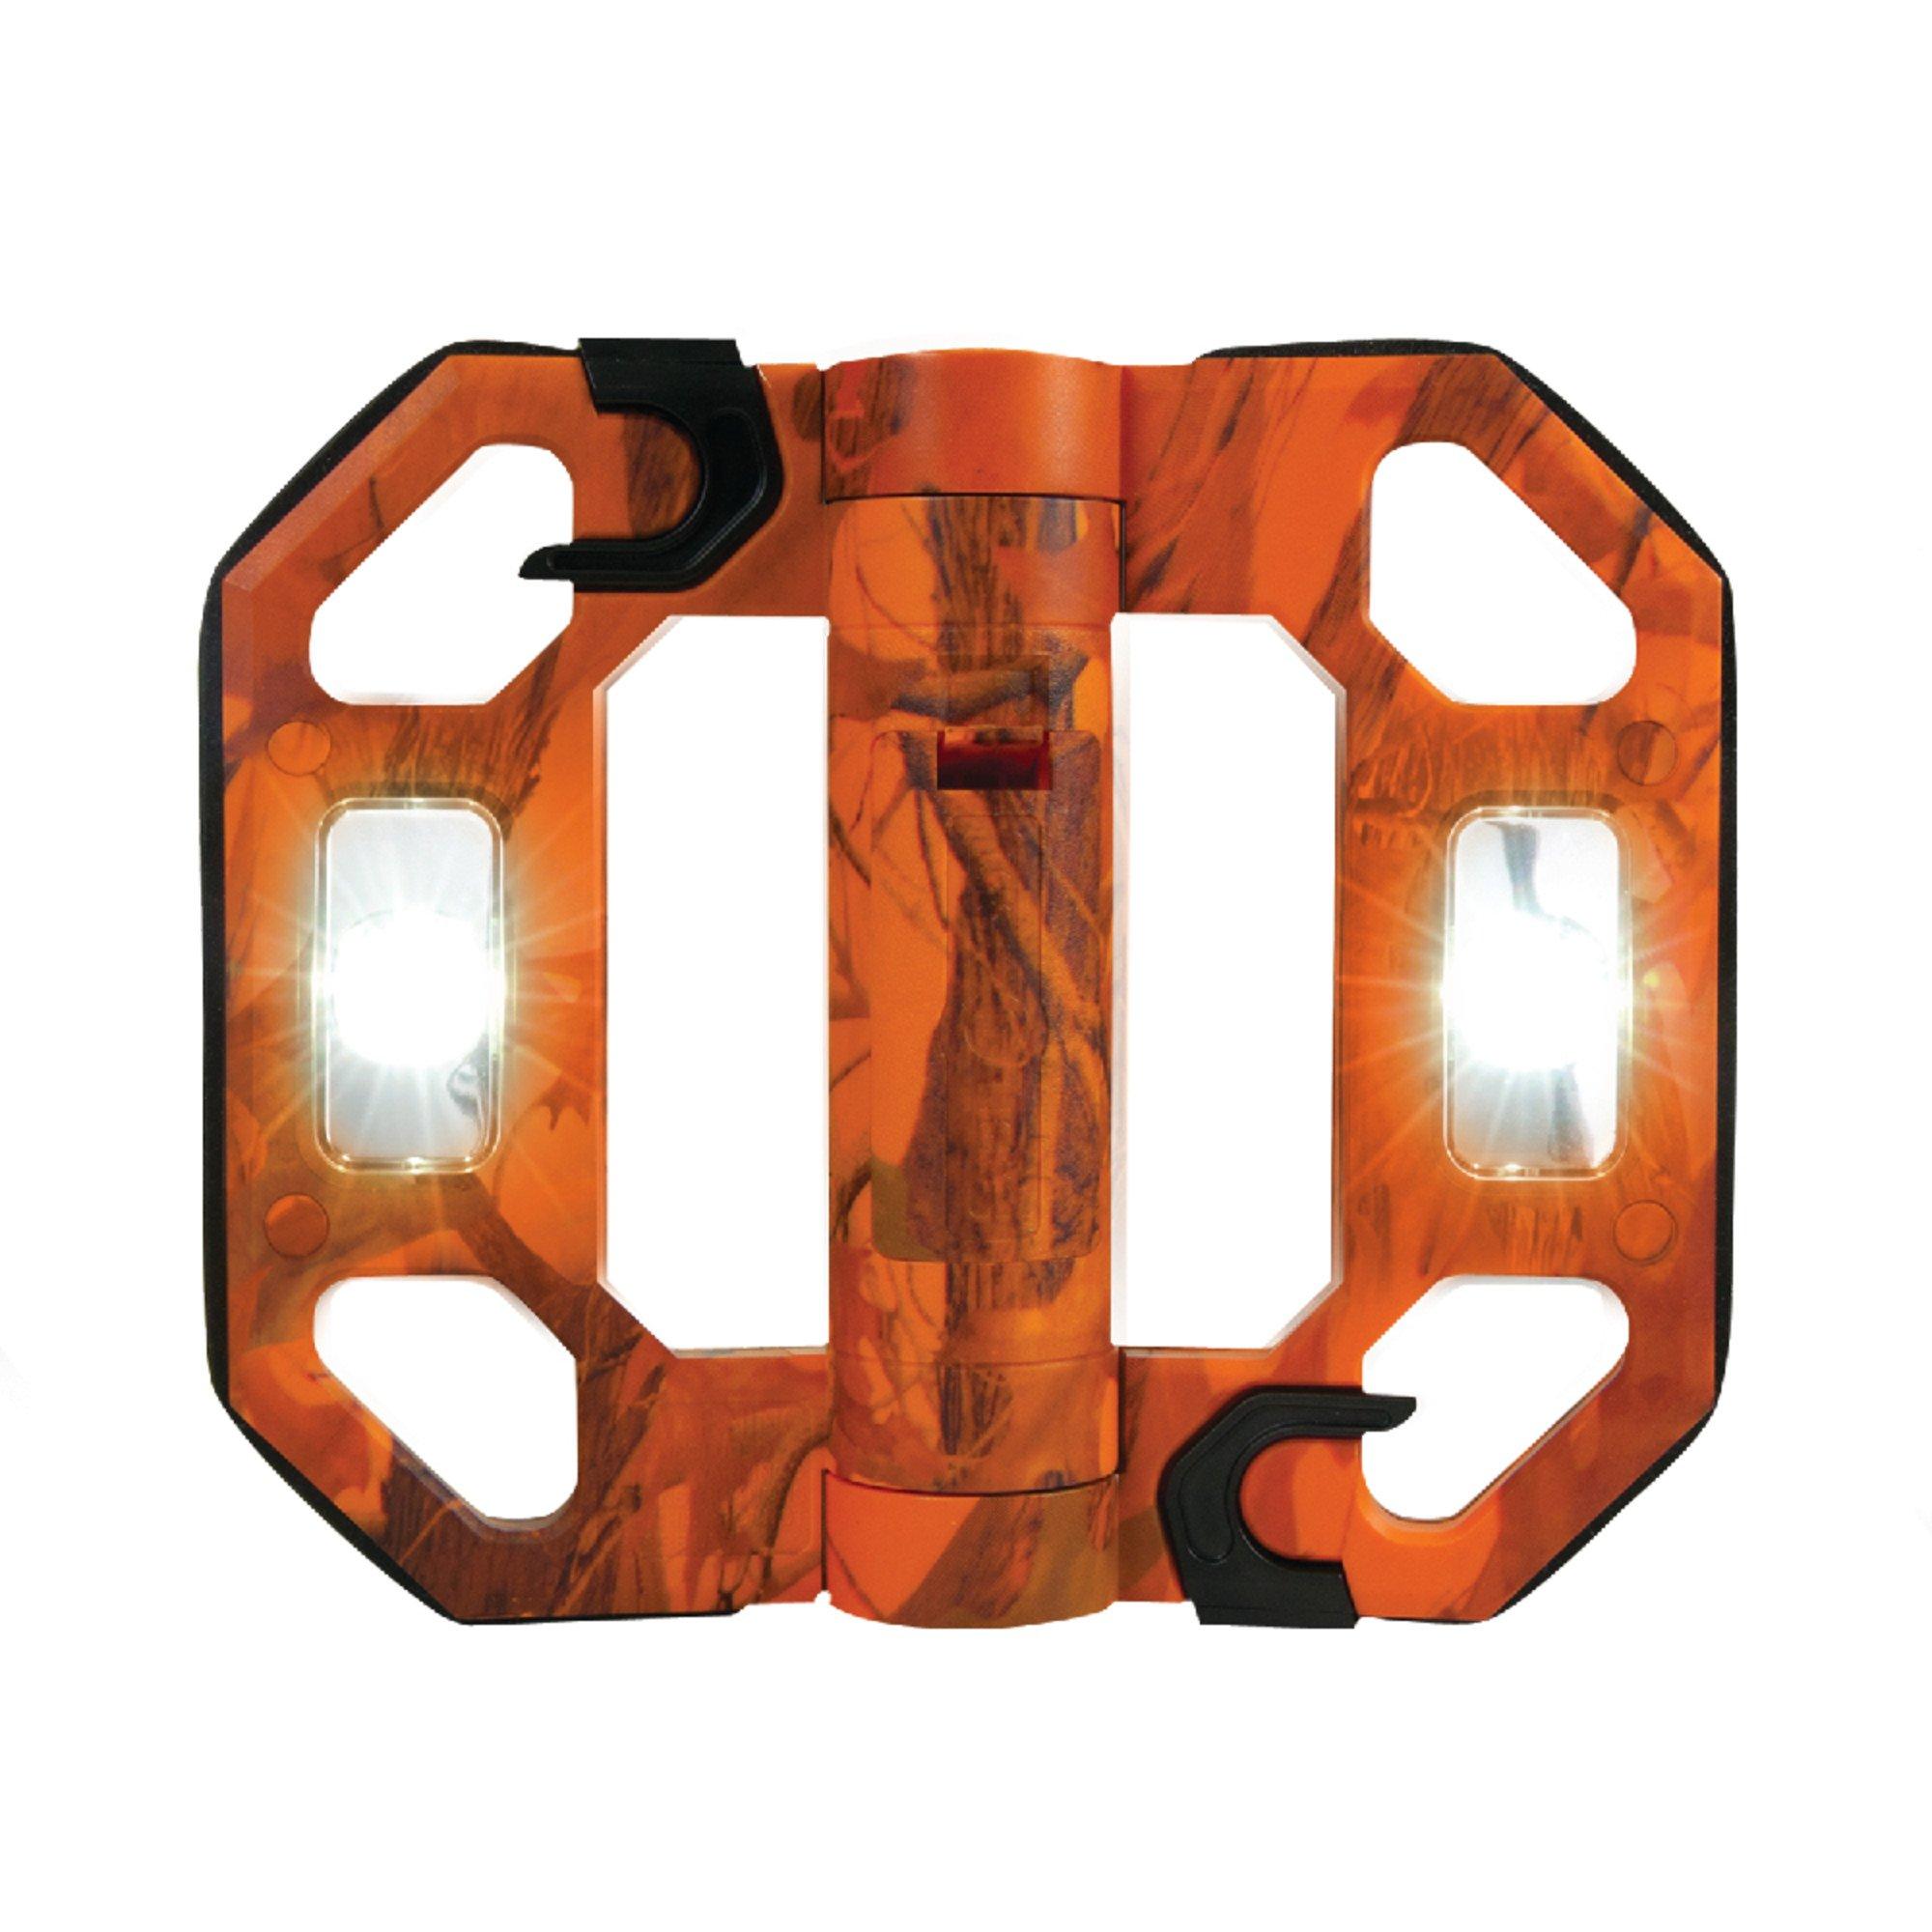 All-Pro LED125O 200-Lumen Mini Compact Folding LED Work Light, Orange by All Pro